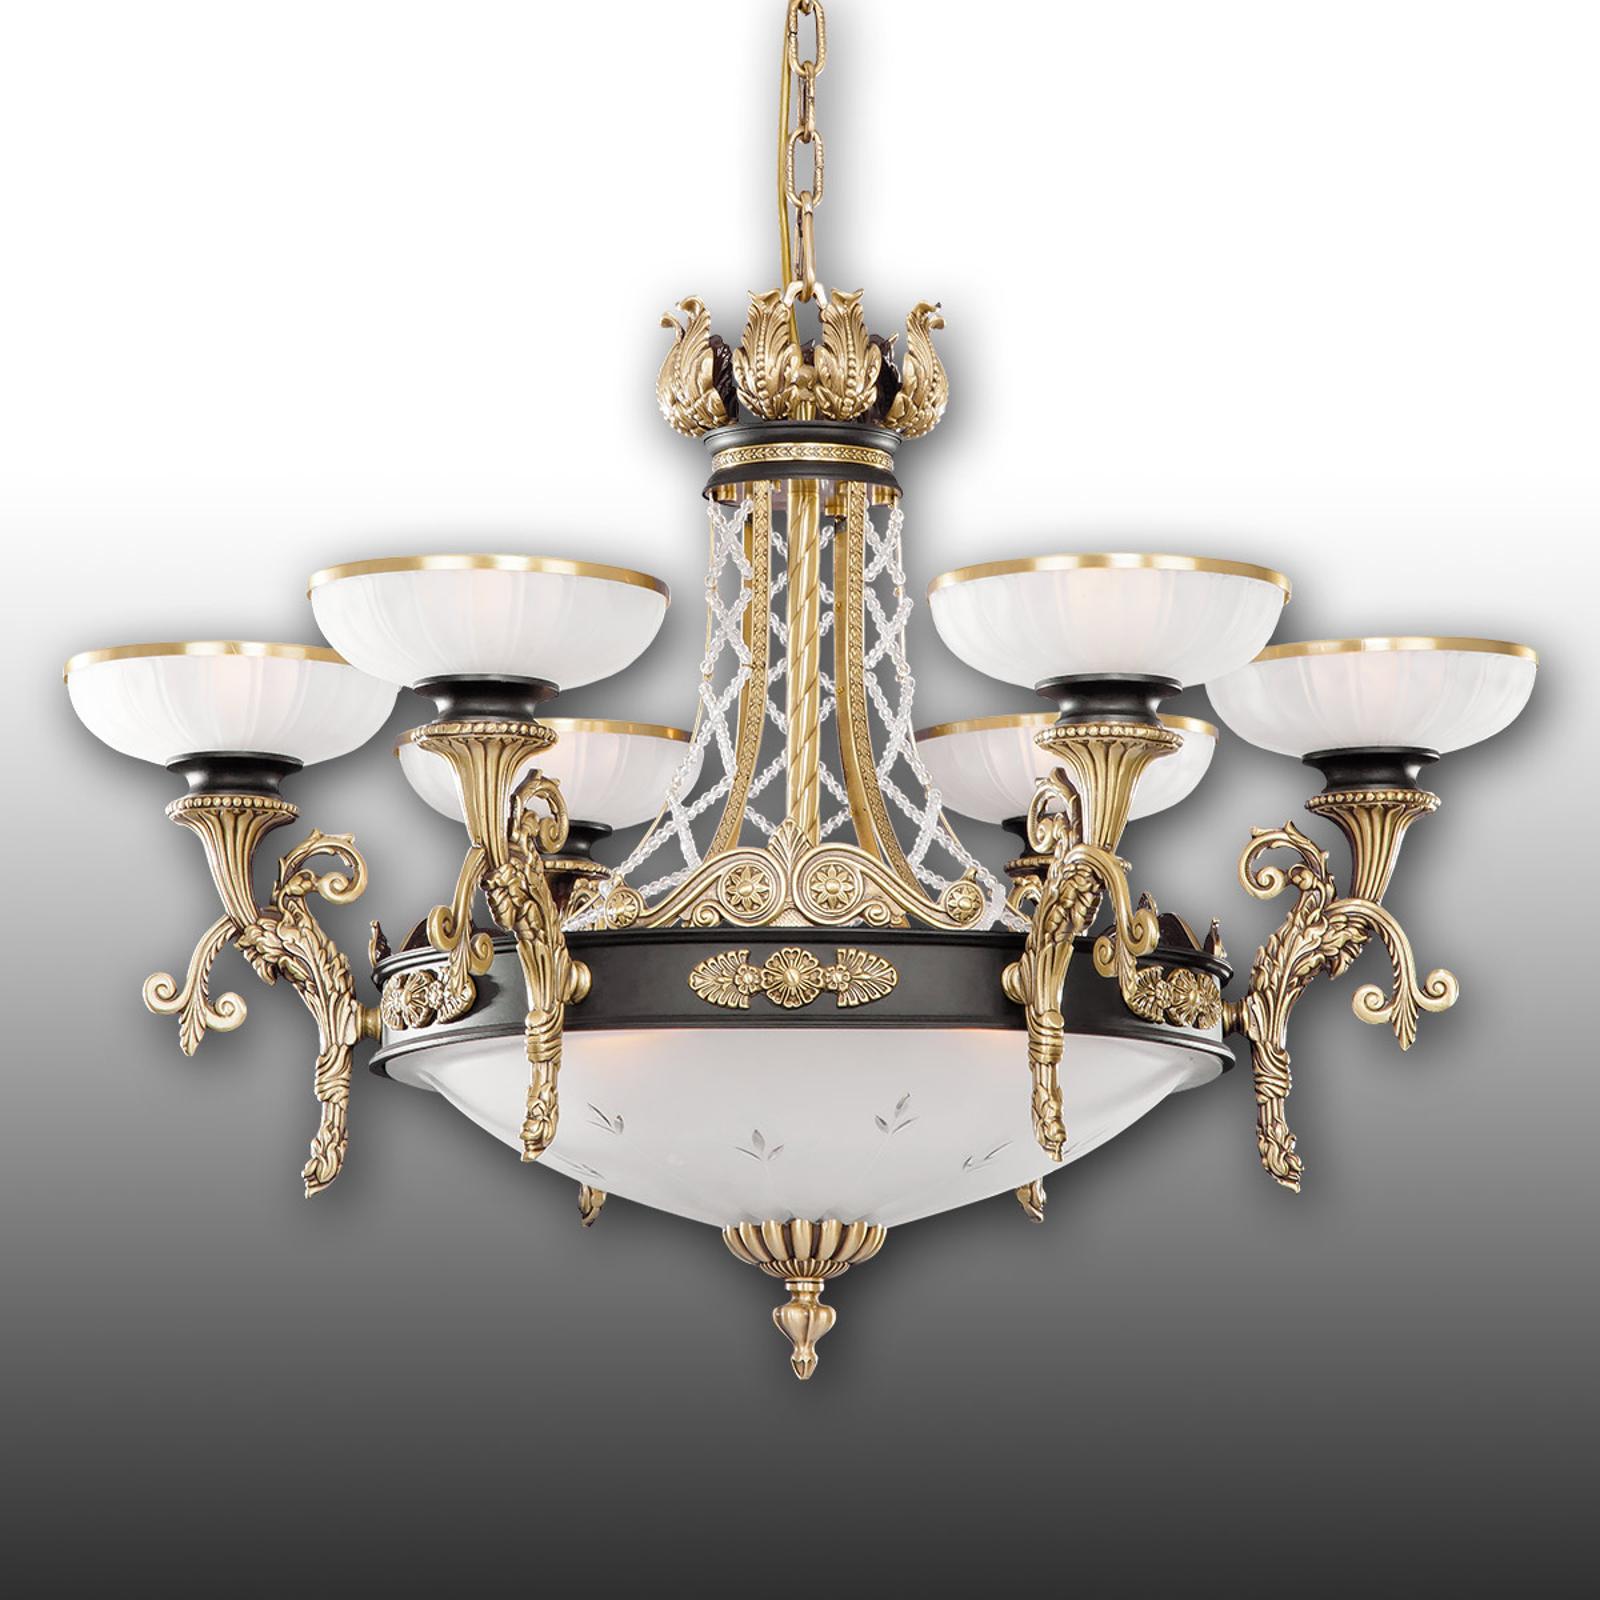 Prunkvoller Kronleuchter Tudor